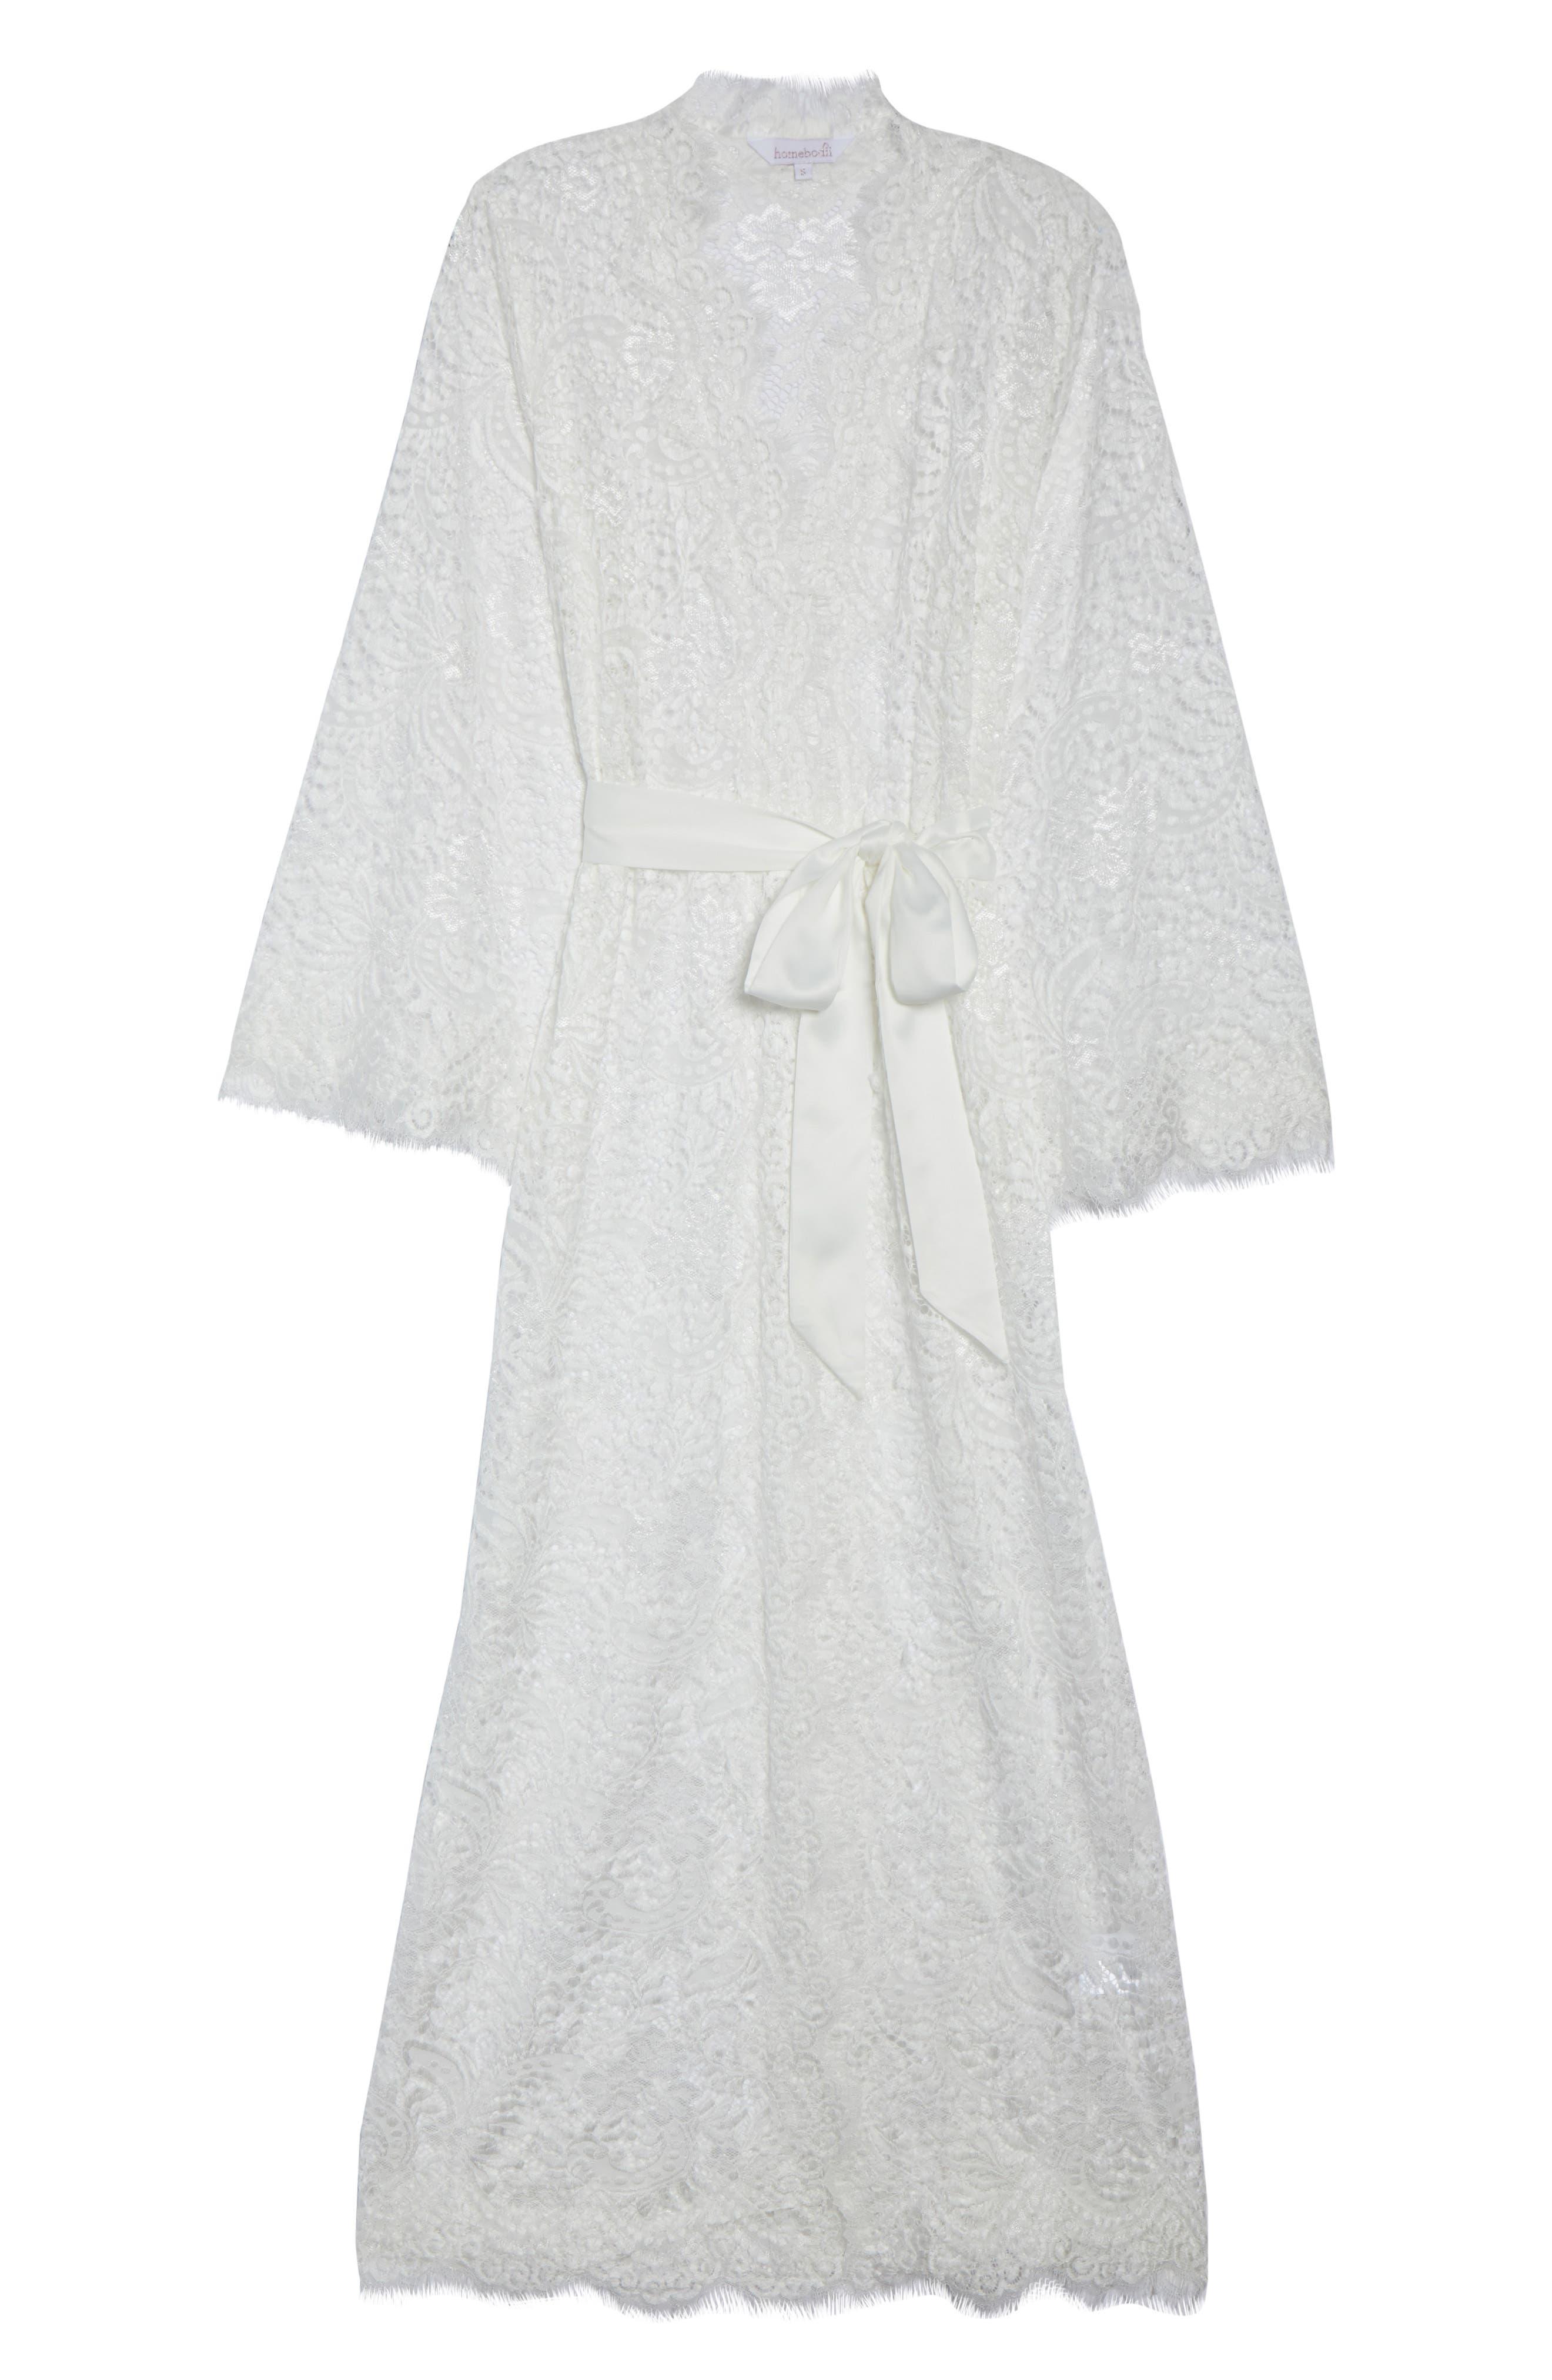 HOMEBODII,                             Anemone Long Lace Wrap,                             Alternate thumbnail 6, color,                             WHITE